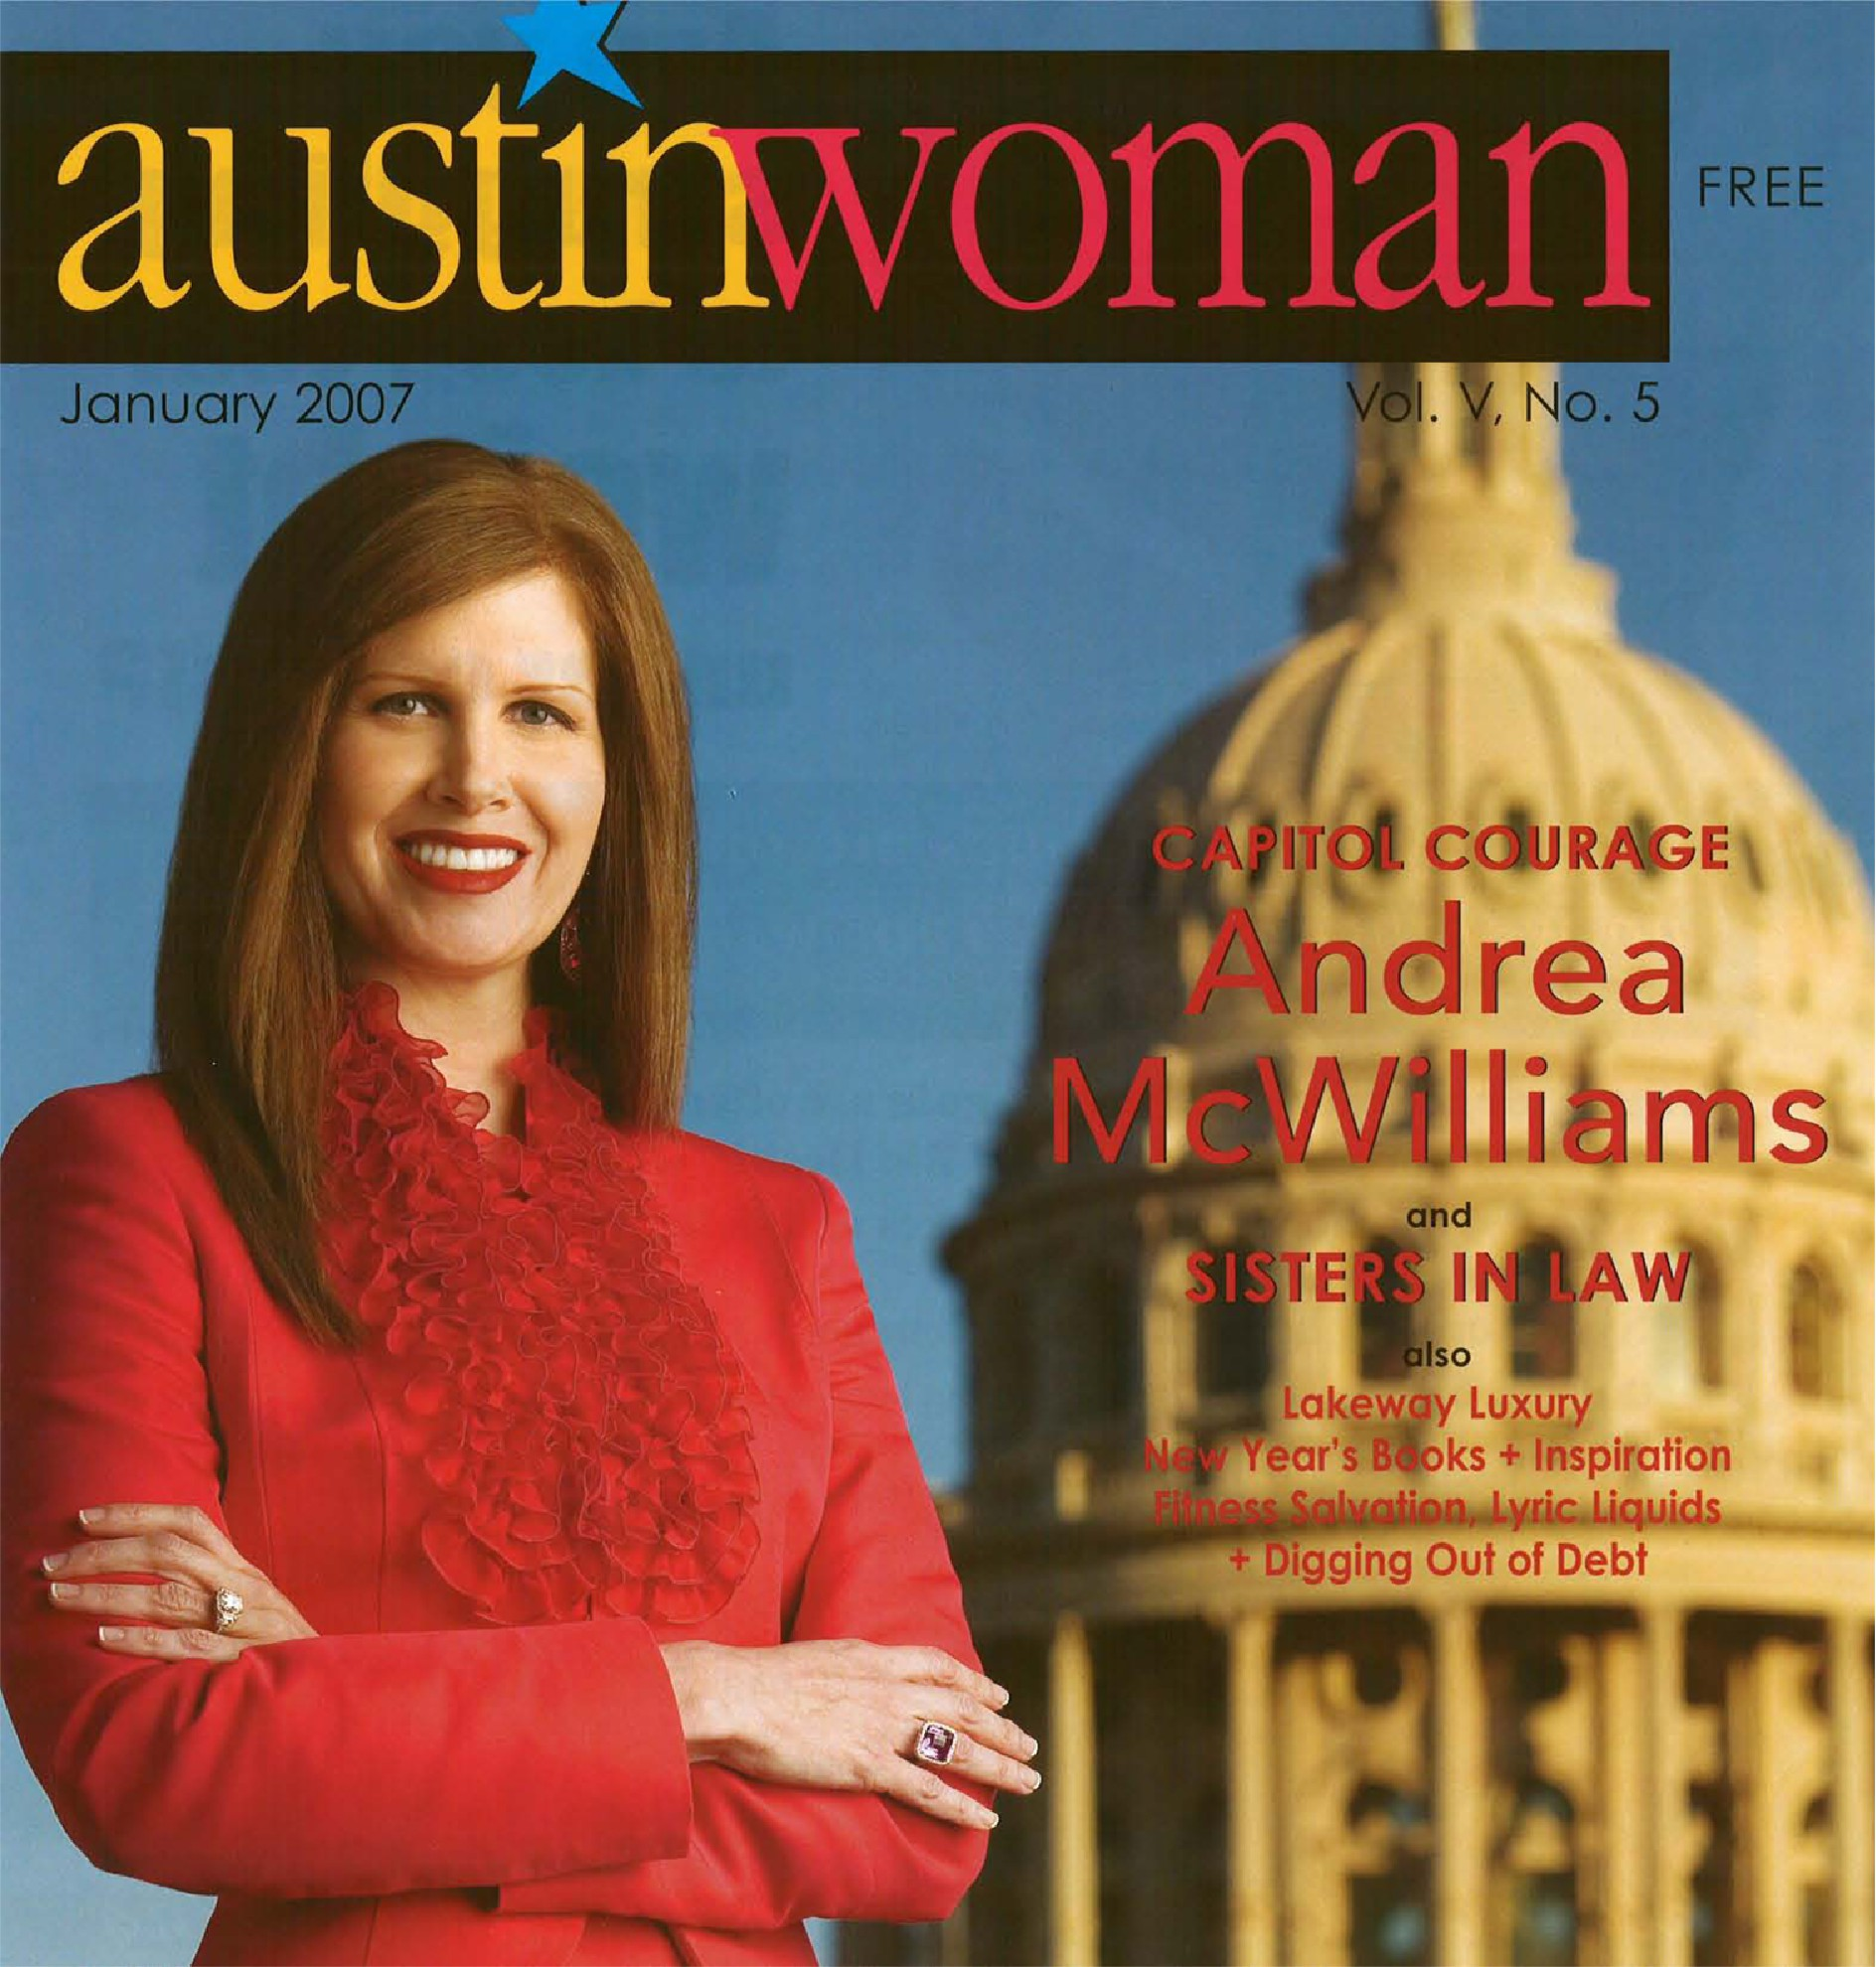 Capitol Courage- Austin Woman